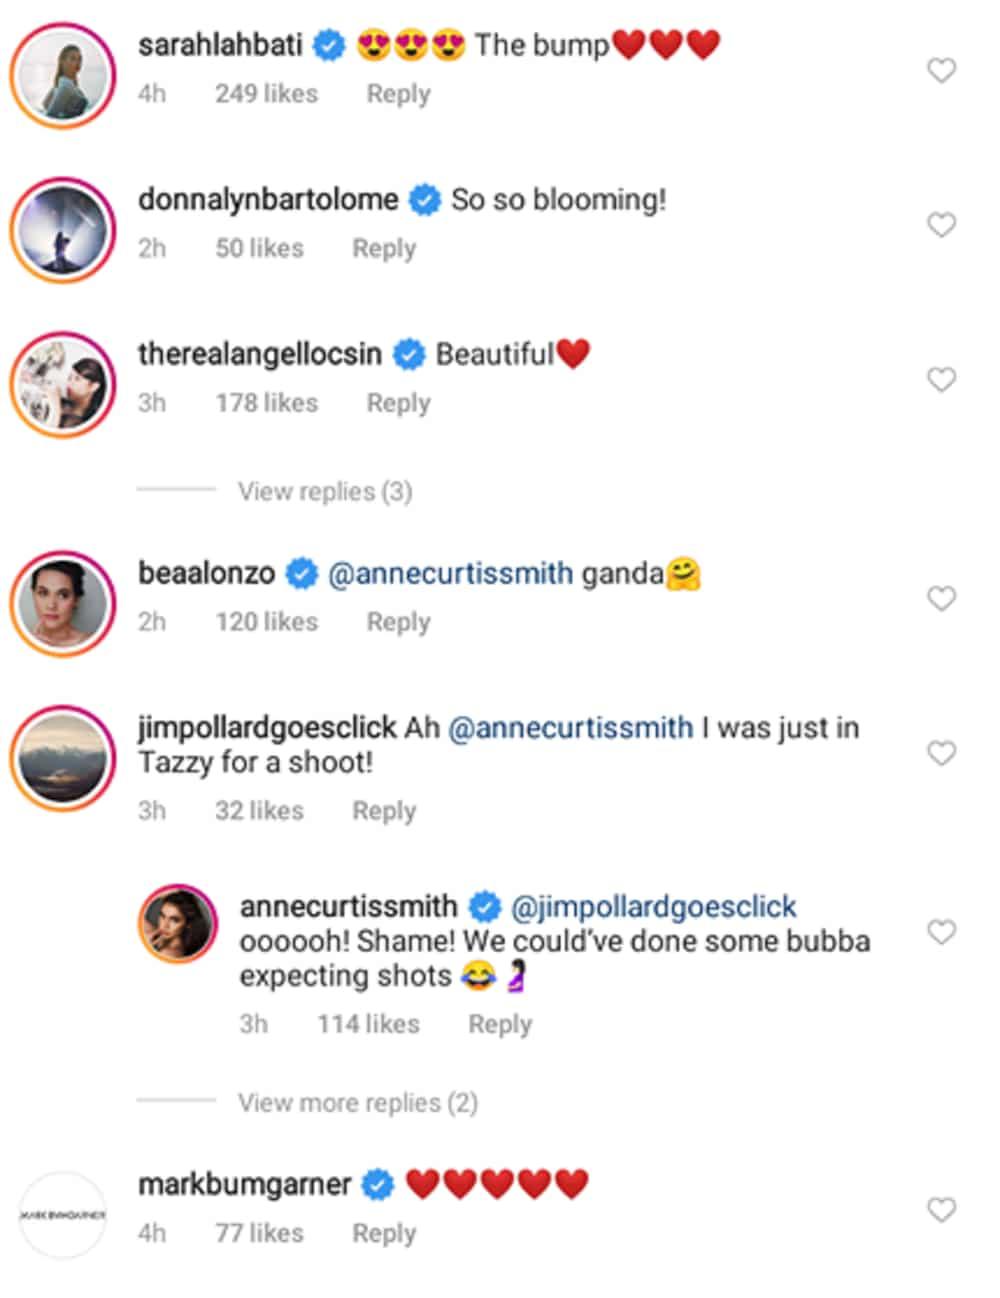 Sarah Lahbati, Bea Alonzo, other celebs react to Anne Curtis' lovely photos